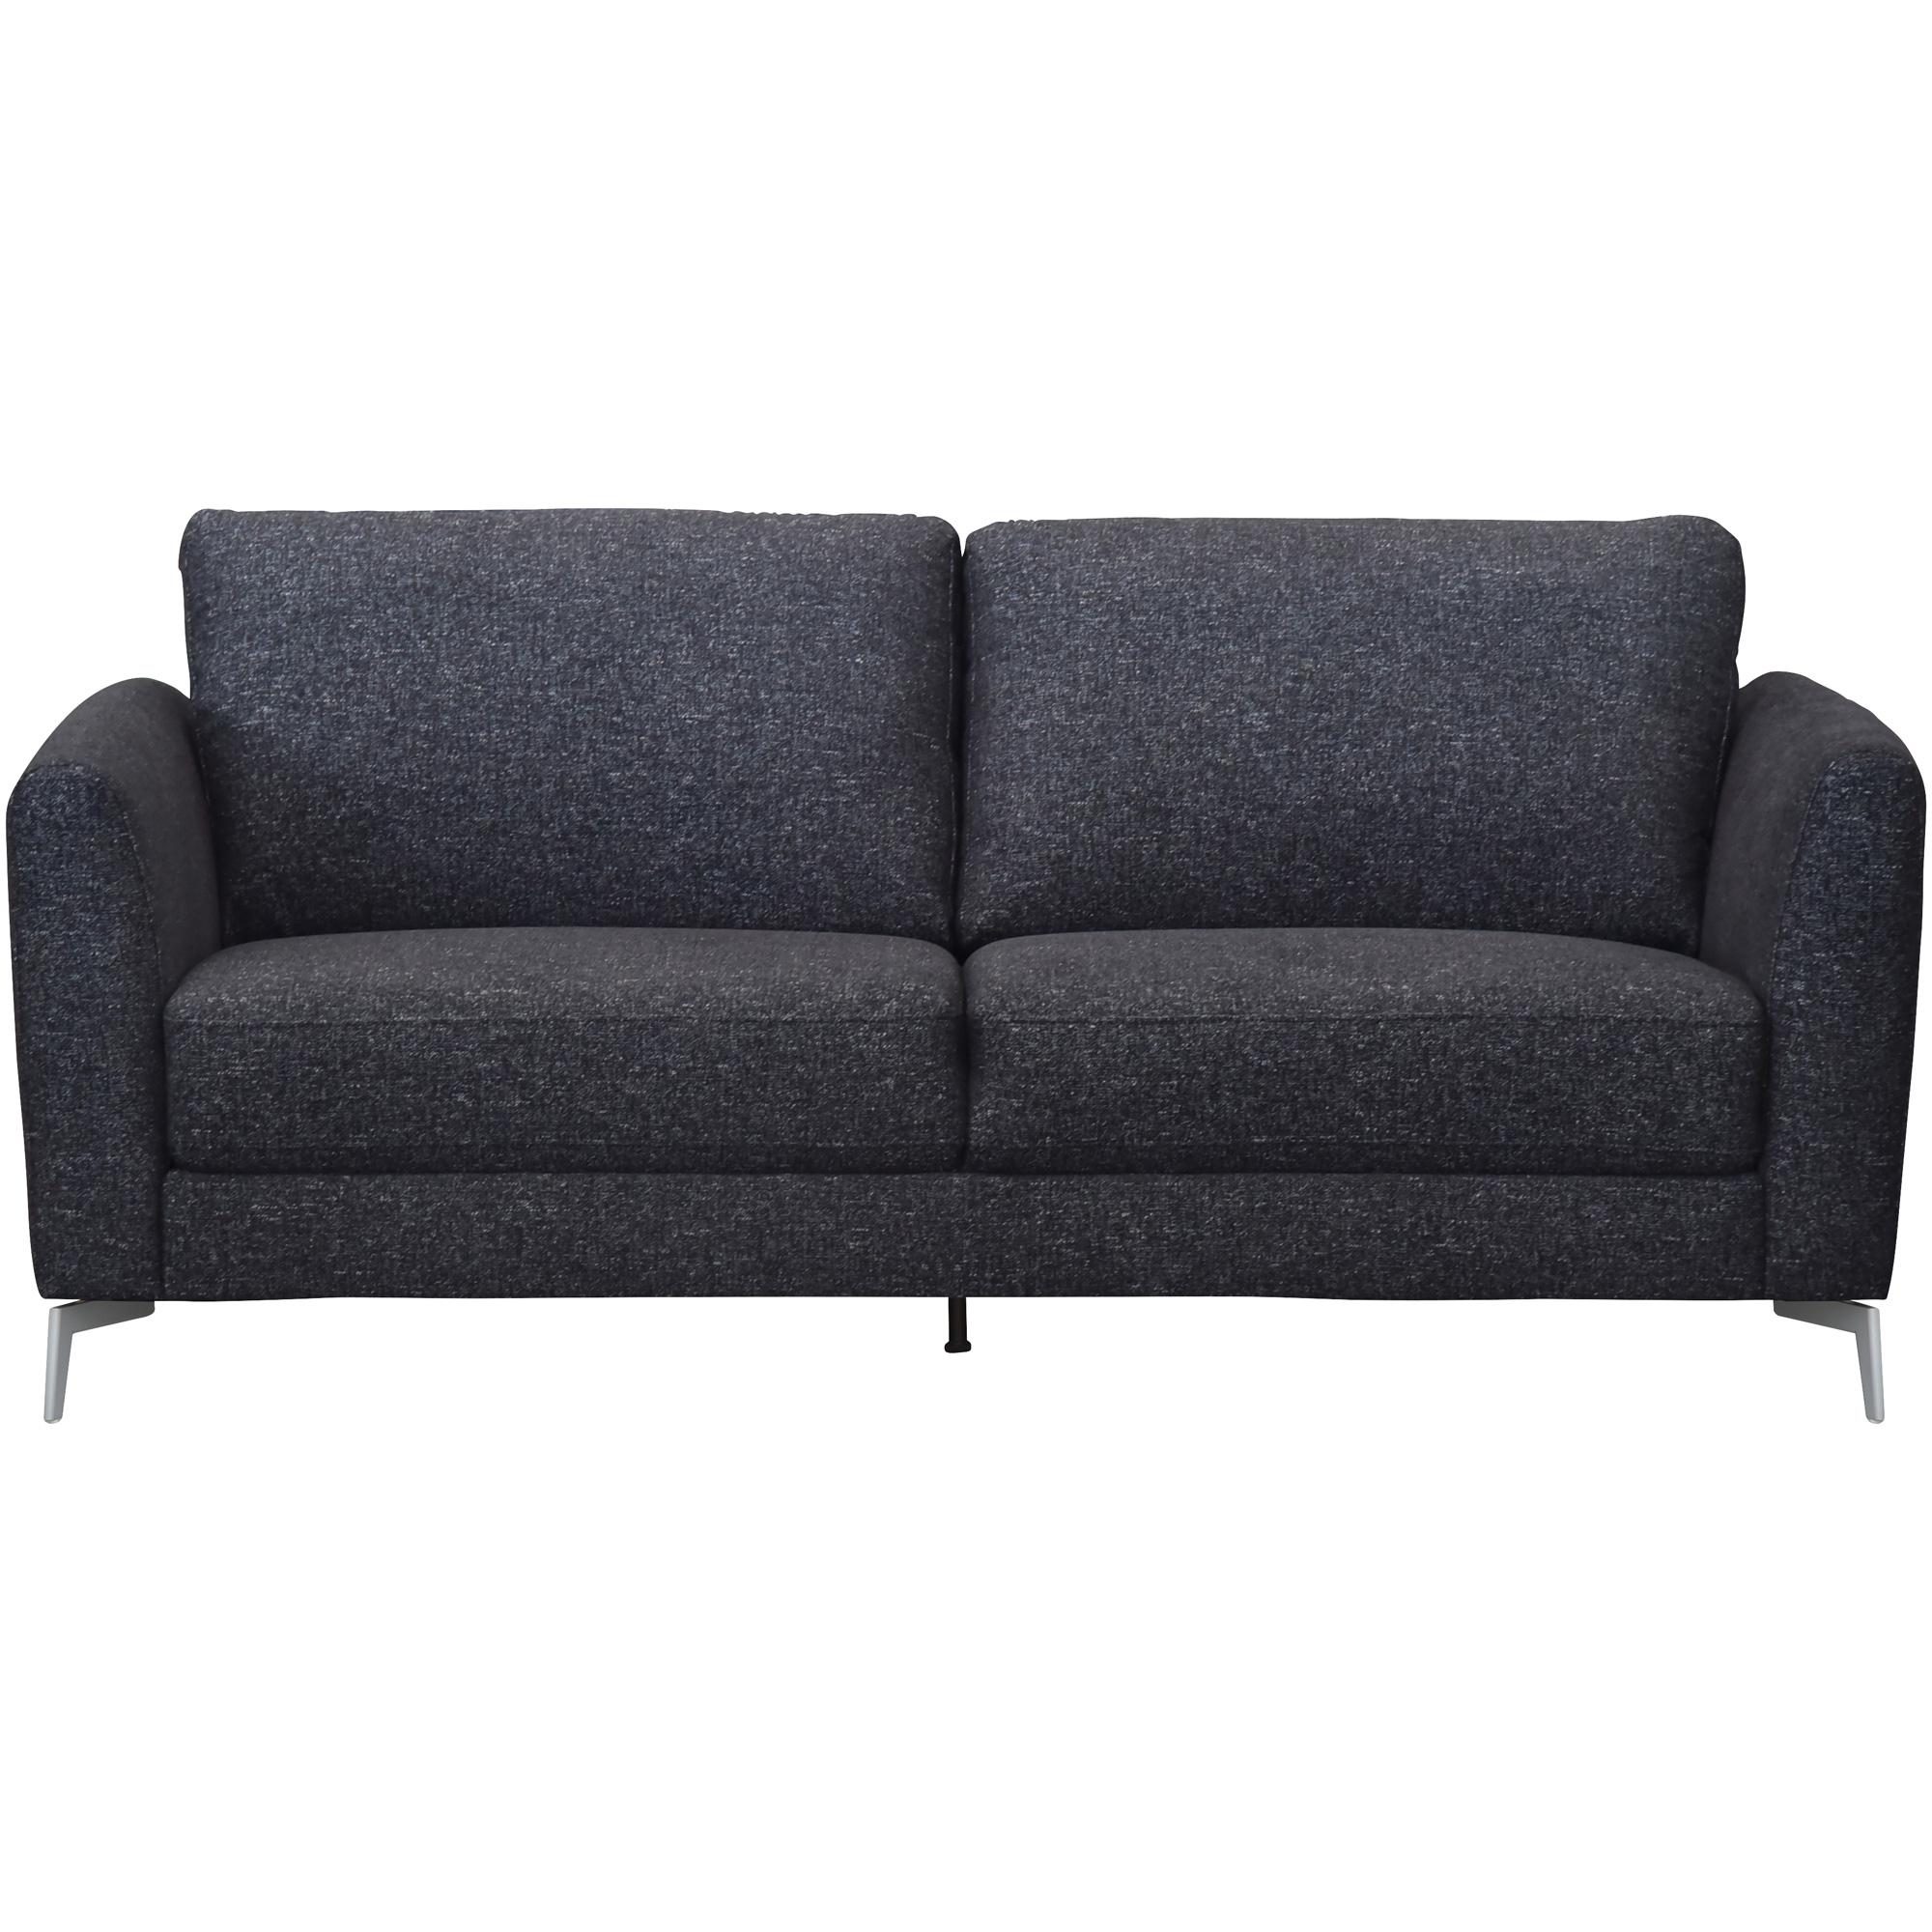 Terrace Living | Stockton Charcoal Sofa